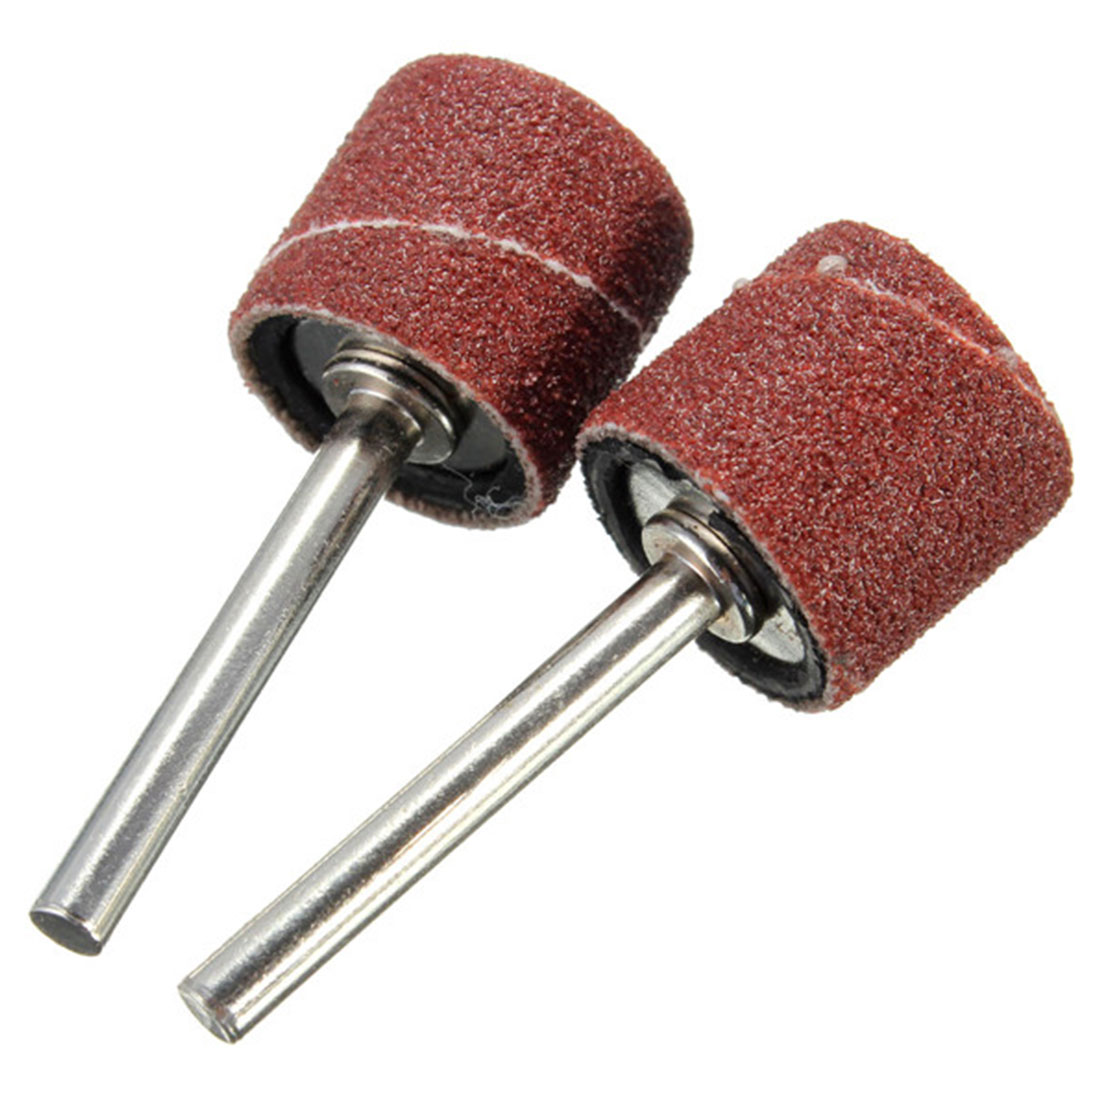 Hot 100pcs/set 80Grit  Sandpaper Grinding Wheel Drum Sanding Kit 1/8 Inch Sand Mandrels Fit For Dremel Nail Drill Rotary Tools